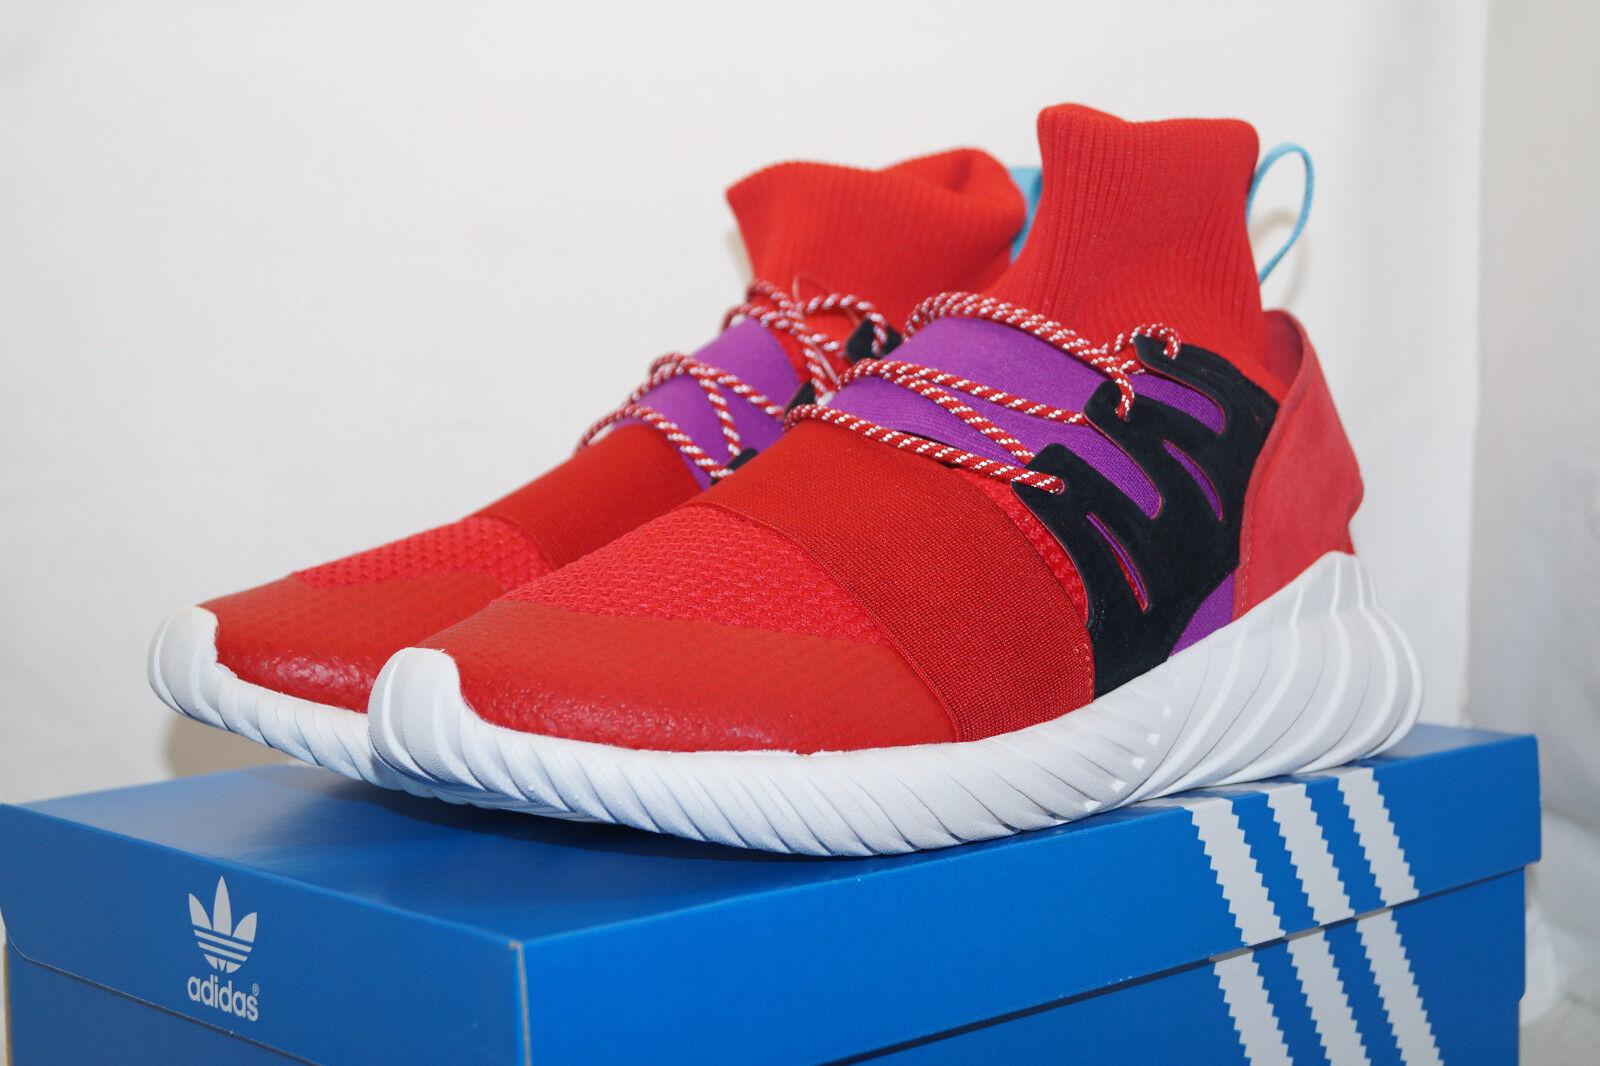 Adidas originals TUBULAR DOOM WINTER EU 45.3 UK 10.5 rot weiss BY9397 Herren